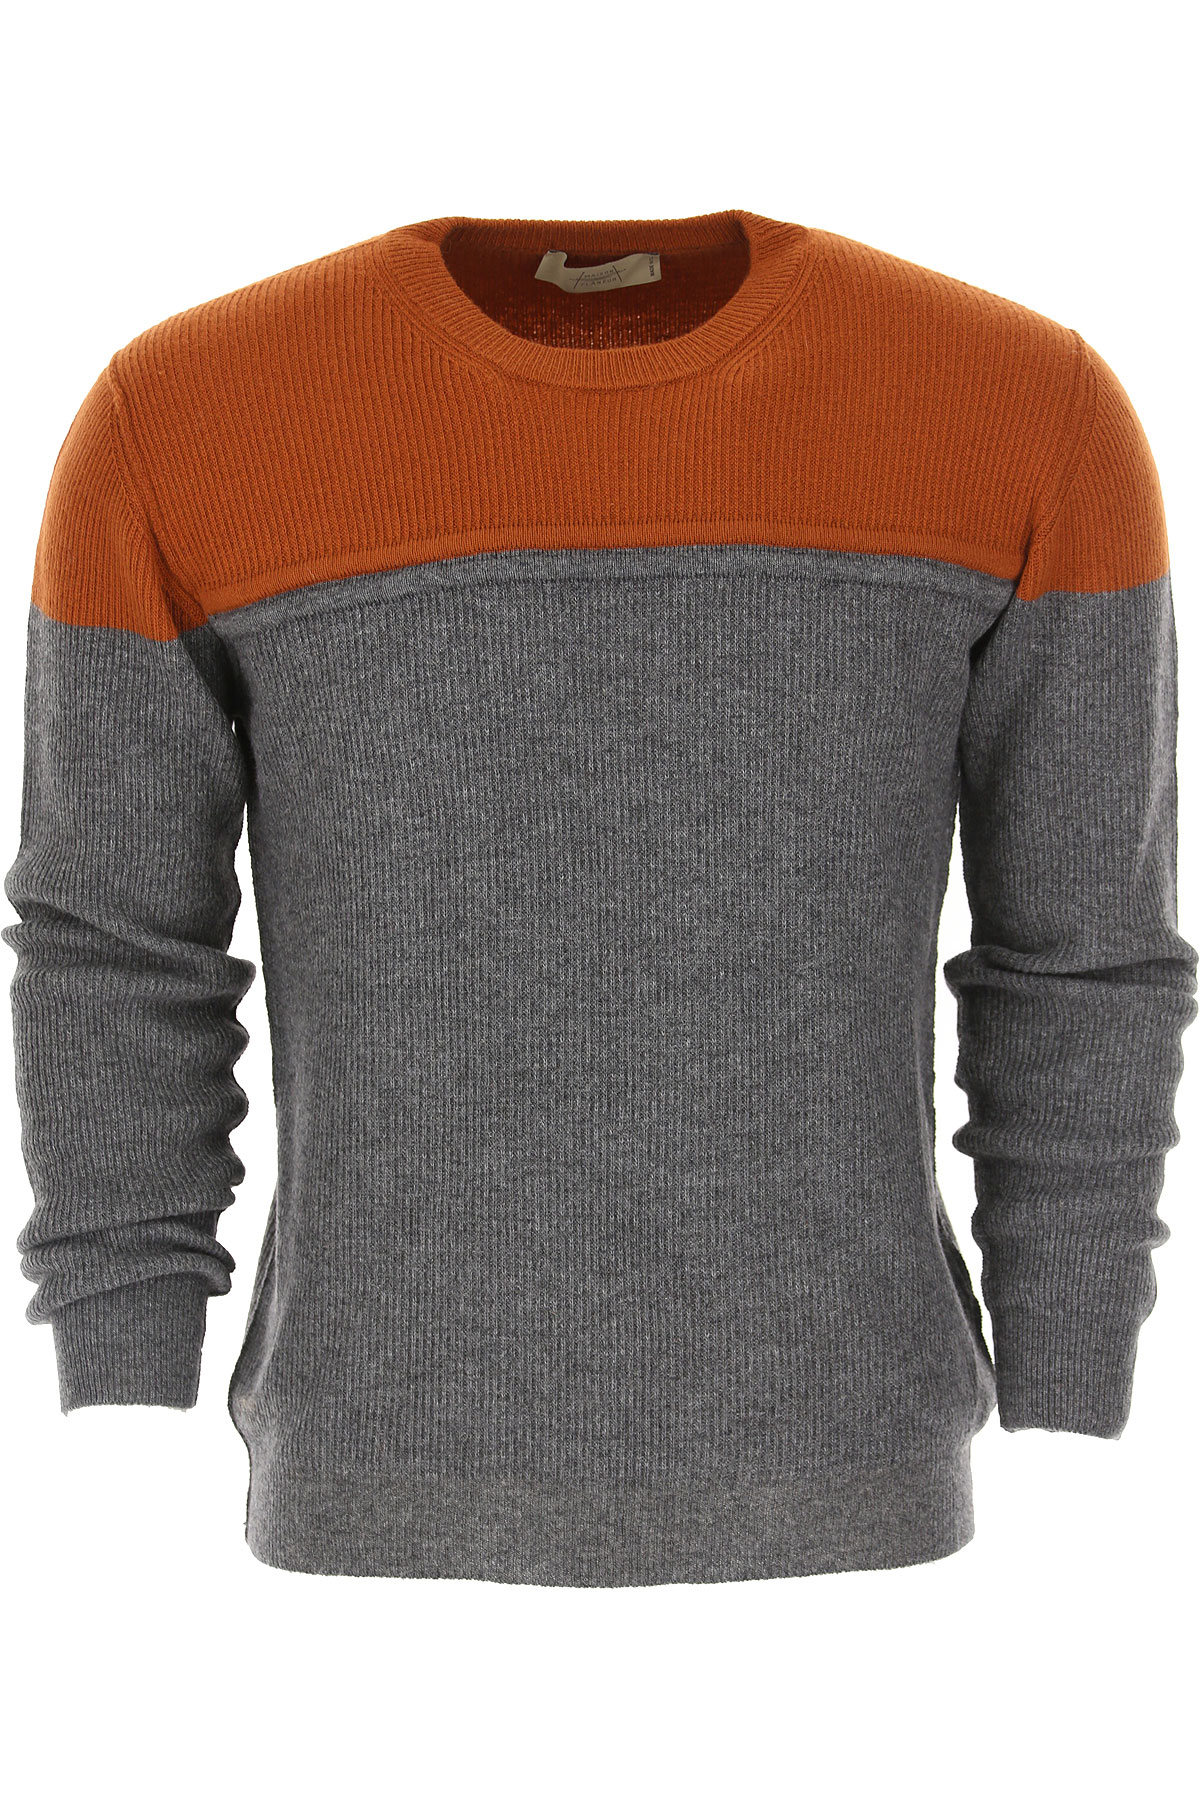 Maison Flaneur Sweater for Men Jumper On Sale, Rust, Virgin wool, 2019, L M S XL